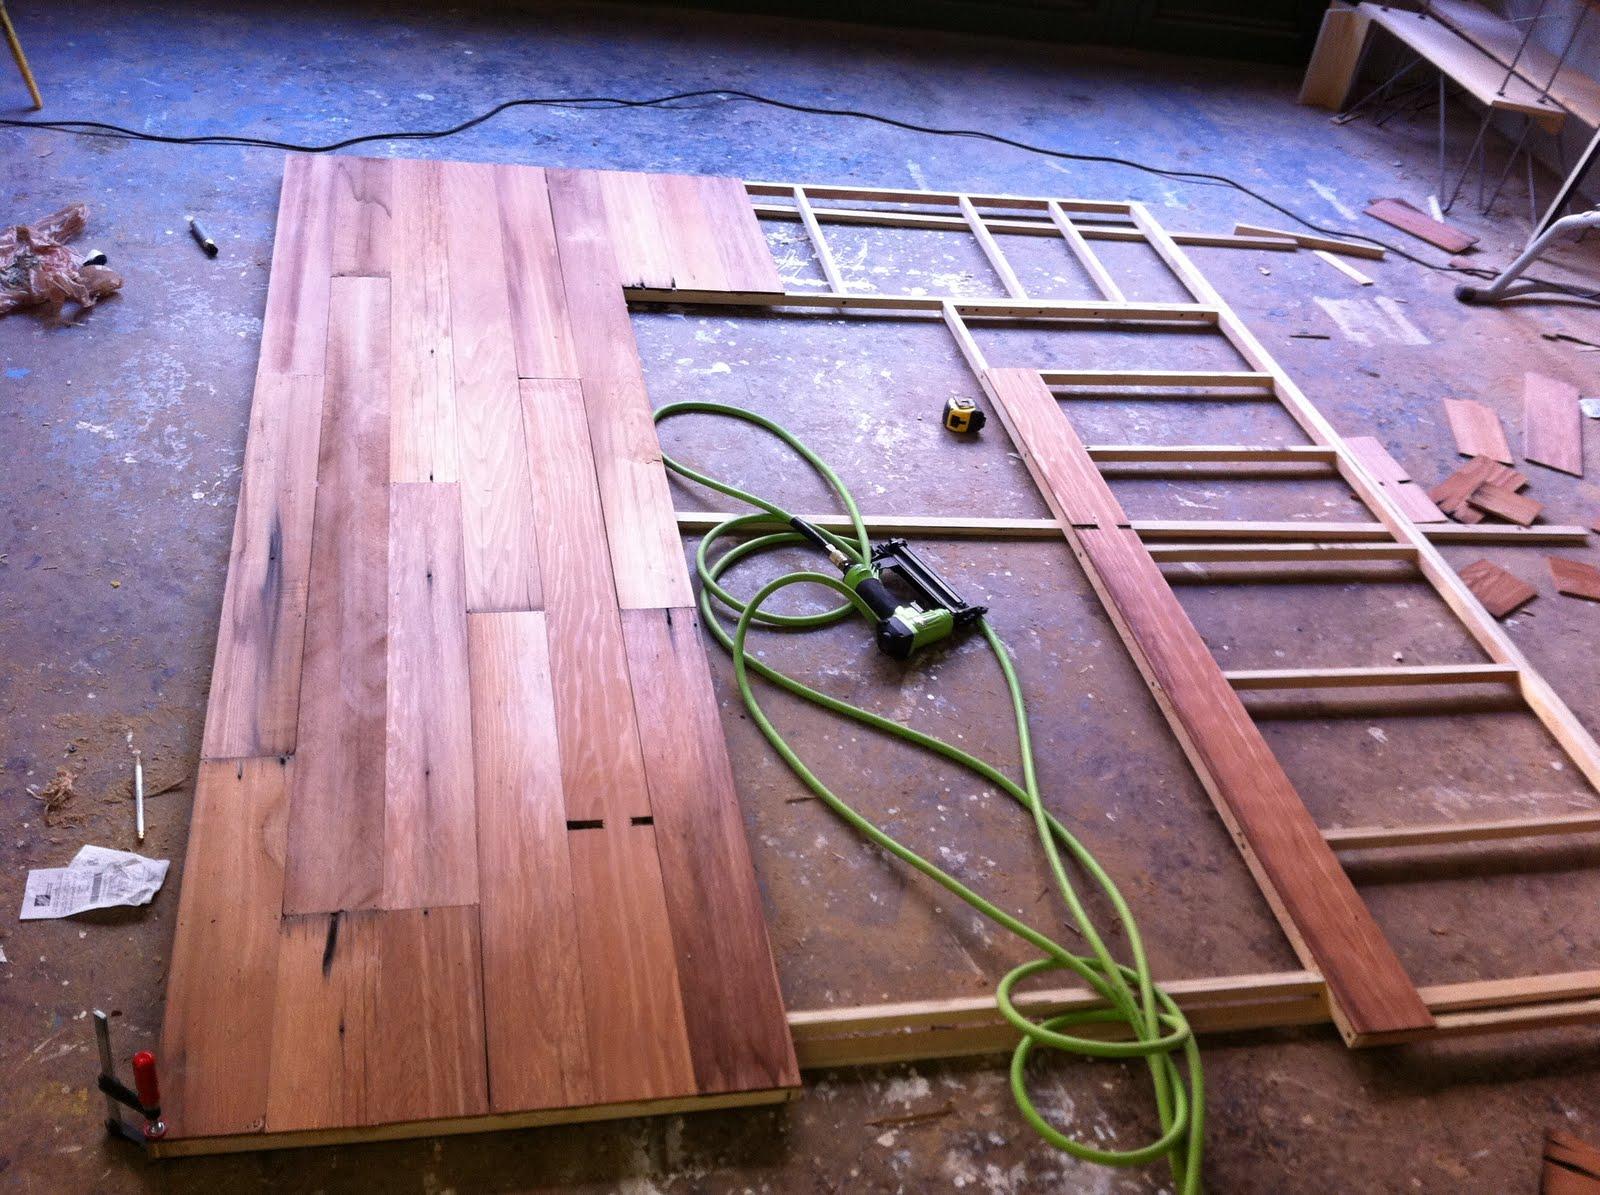 http://4.bp.blogspot.com/-L8QeZ5wq1t0/TeJuIeeqihI/AAAAAAAAAE4/AxN28V-AAuk/s1600/mark+reclaimed+wall+assembly.JPG